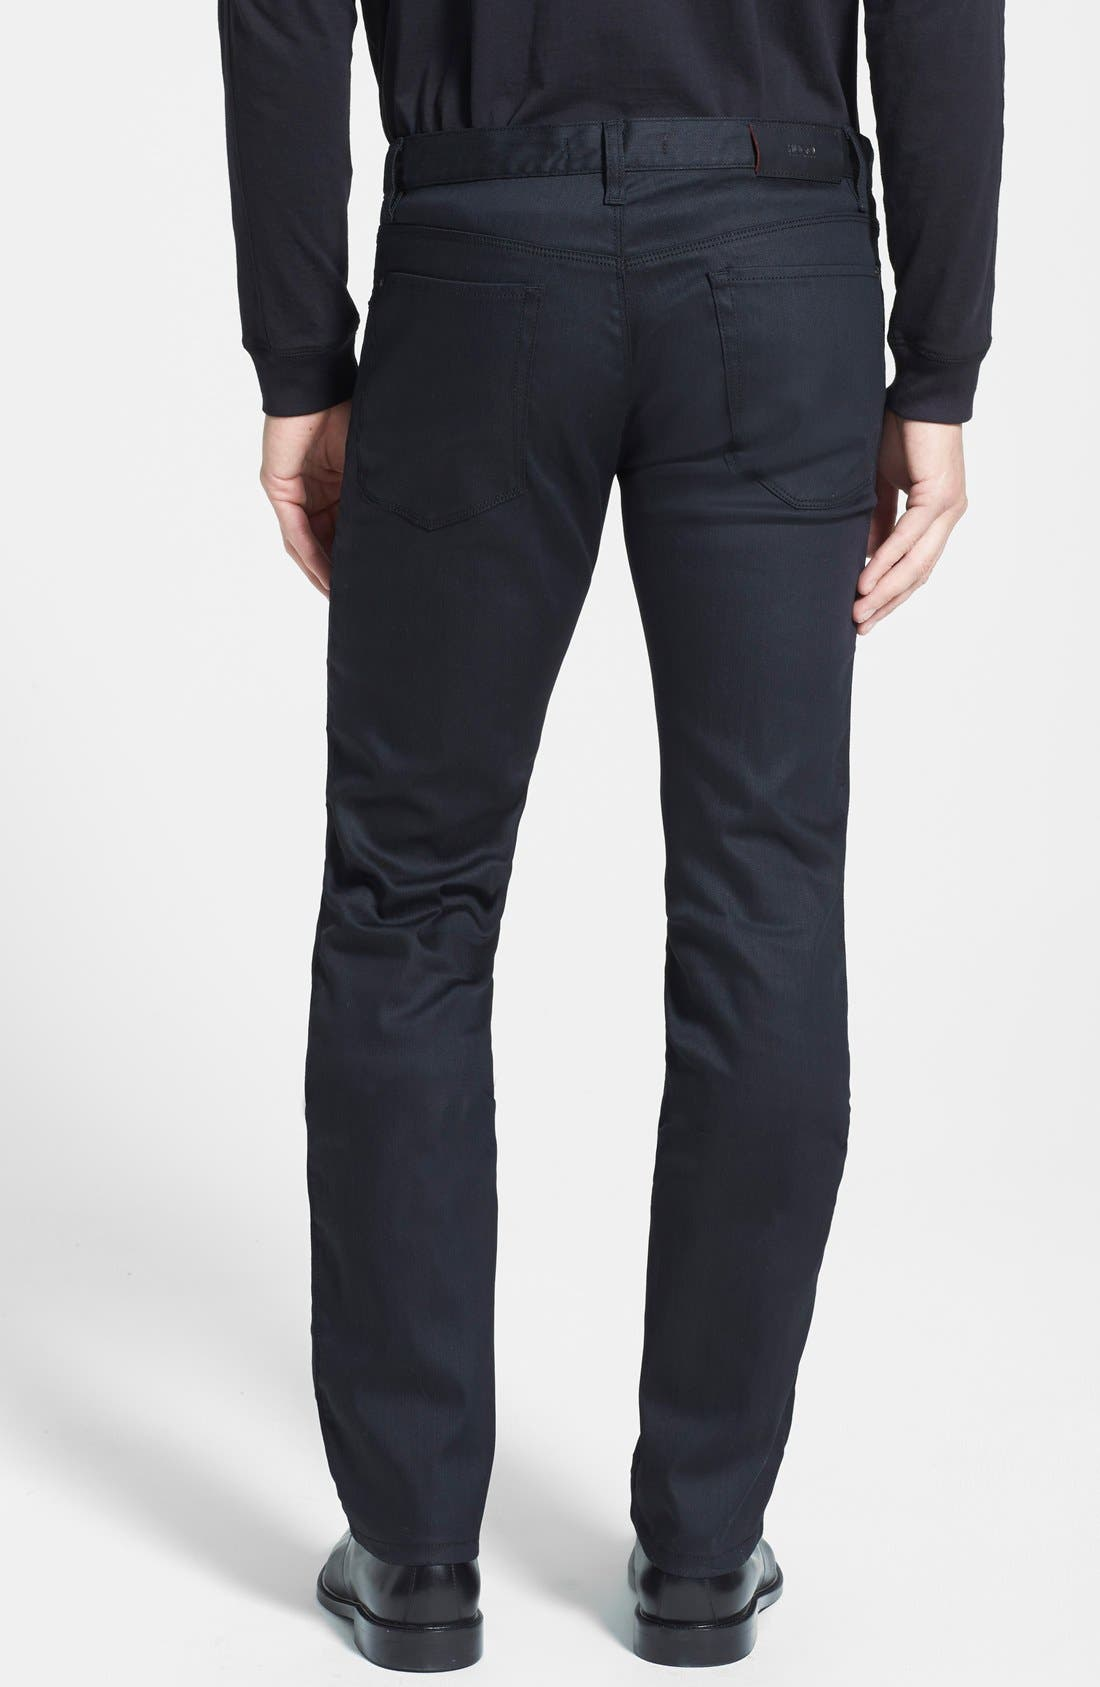 HUGO '708' Slim Fit Jeans,                             Alternate thumbnail 6, color,                             001